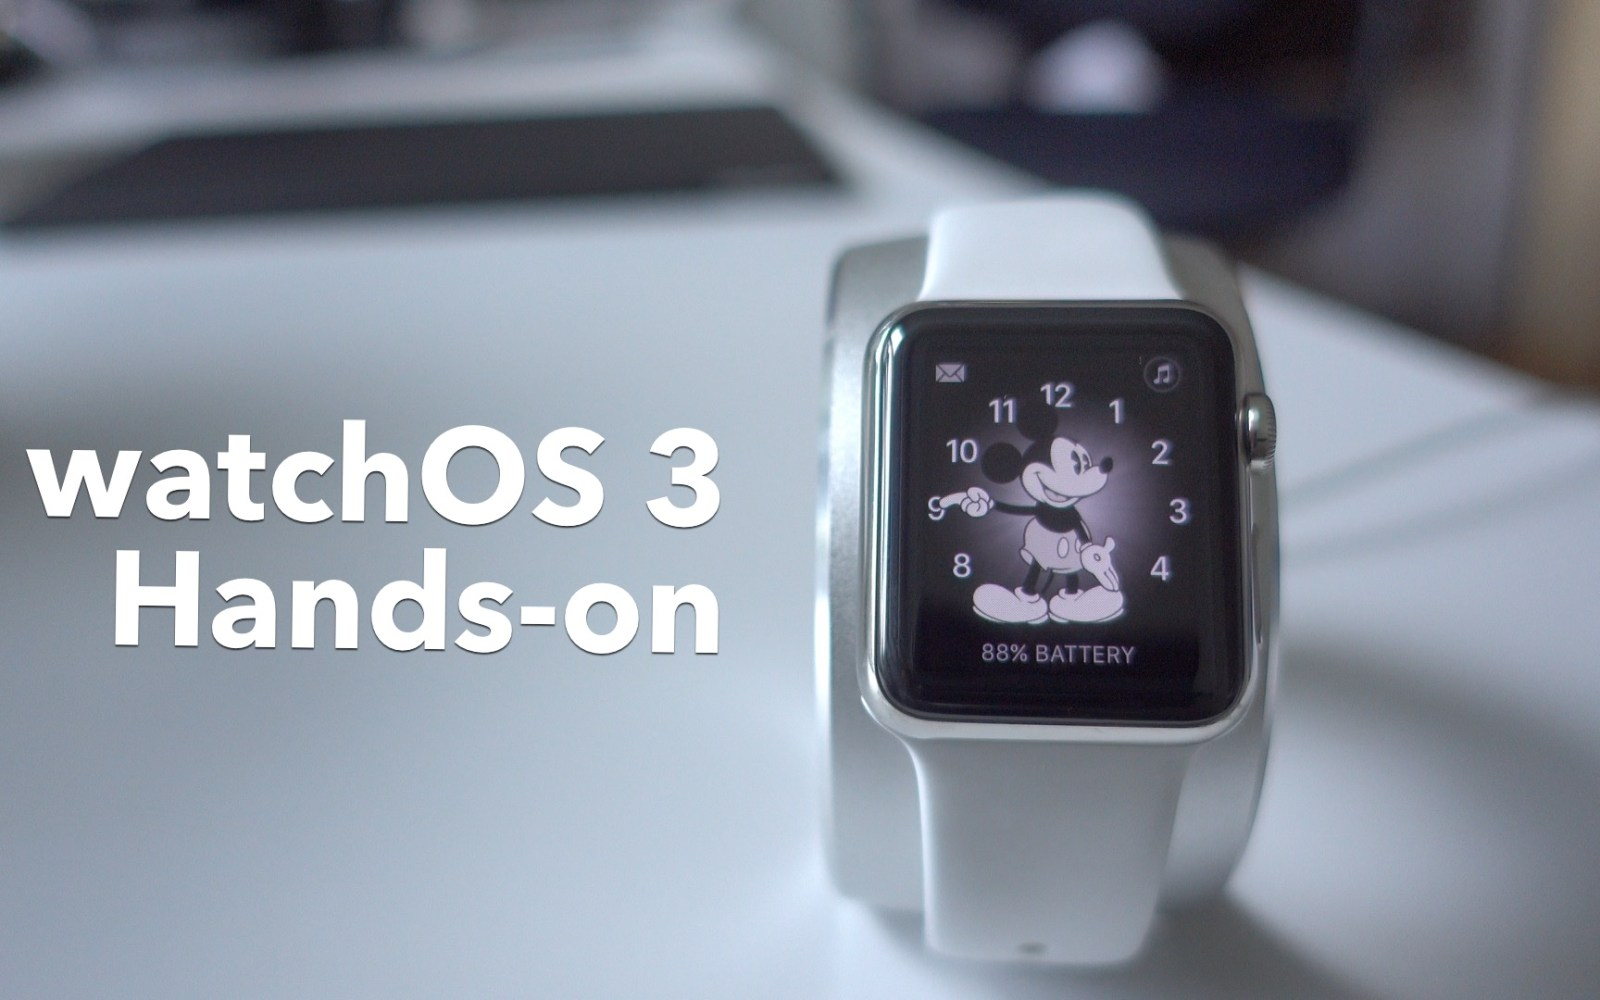 Hands-on: New features in watchOS 3 [Video]